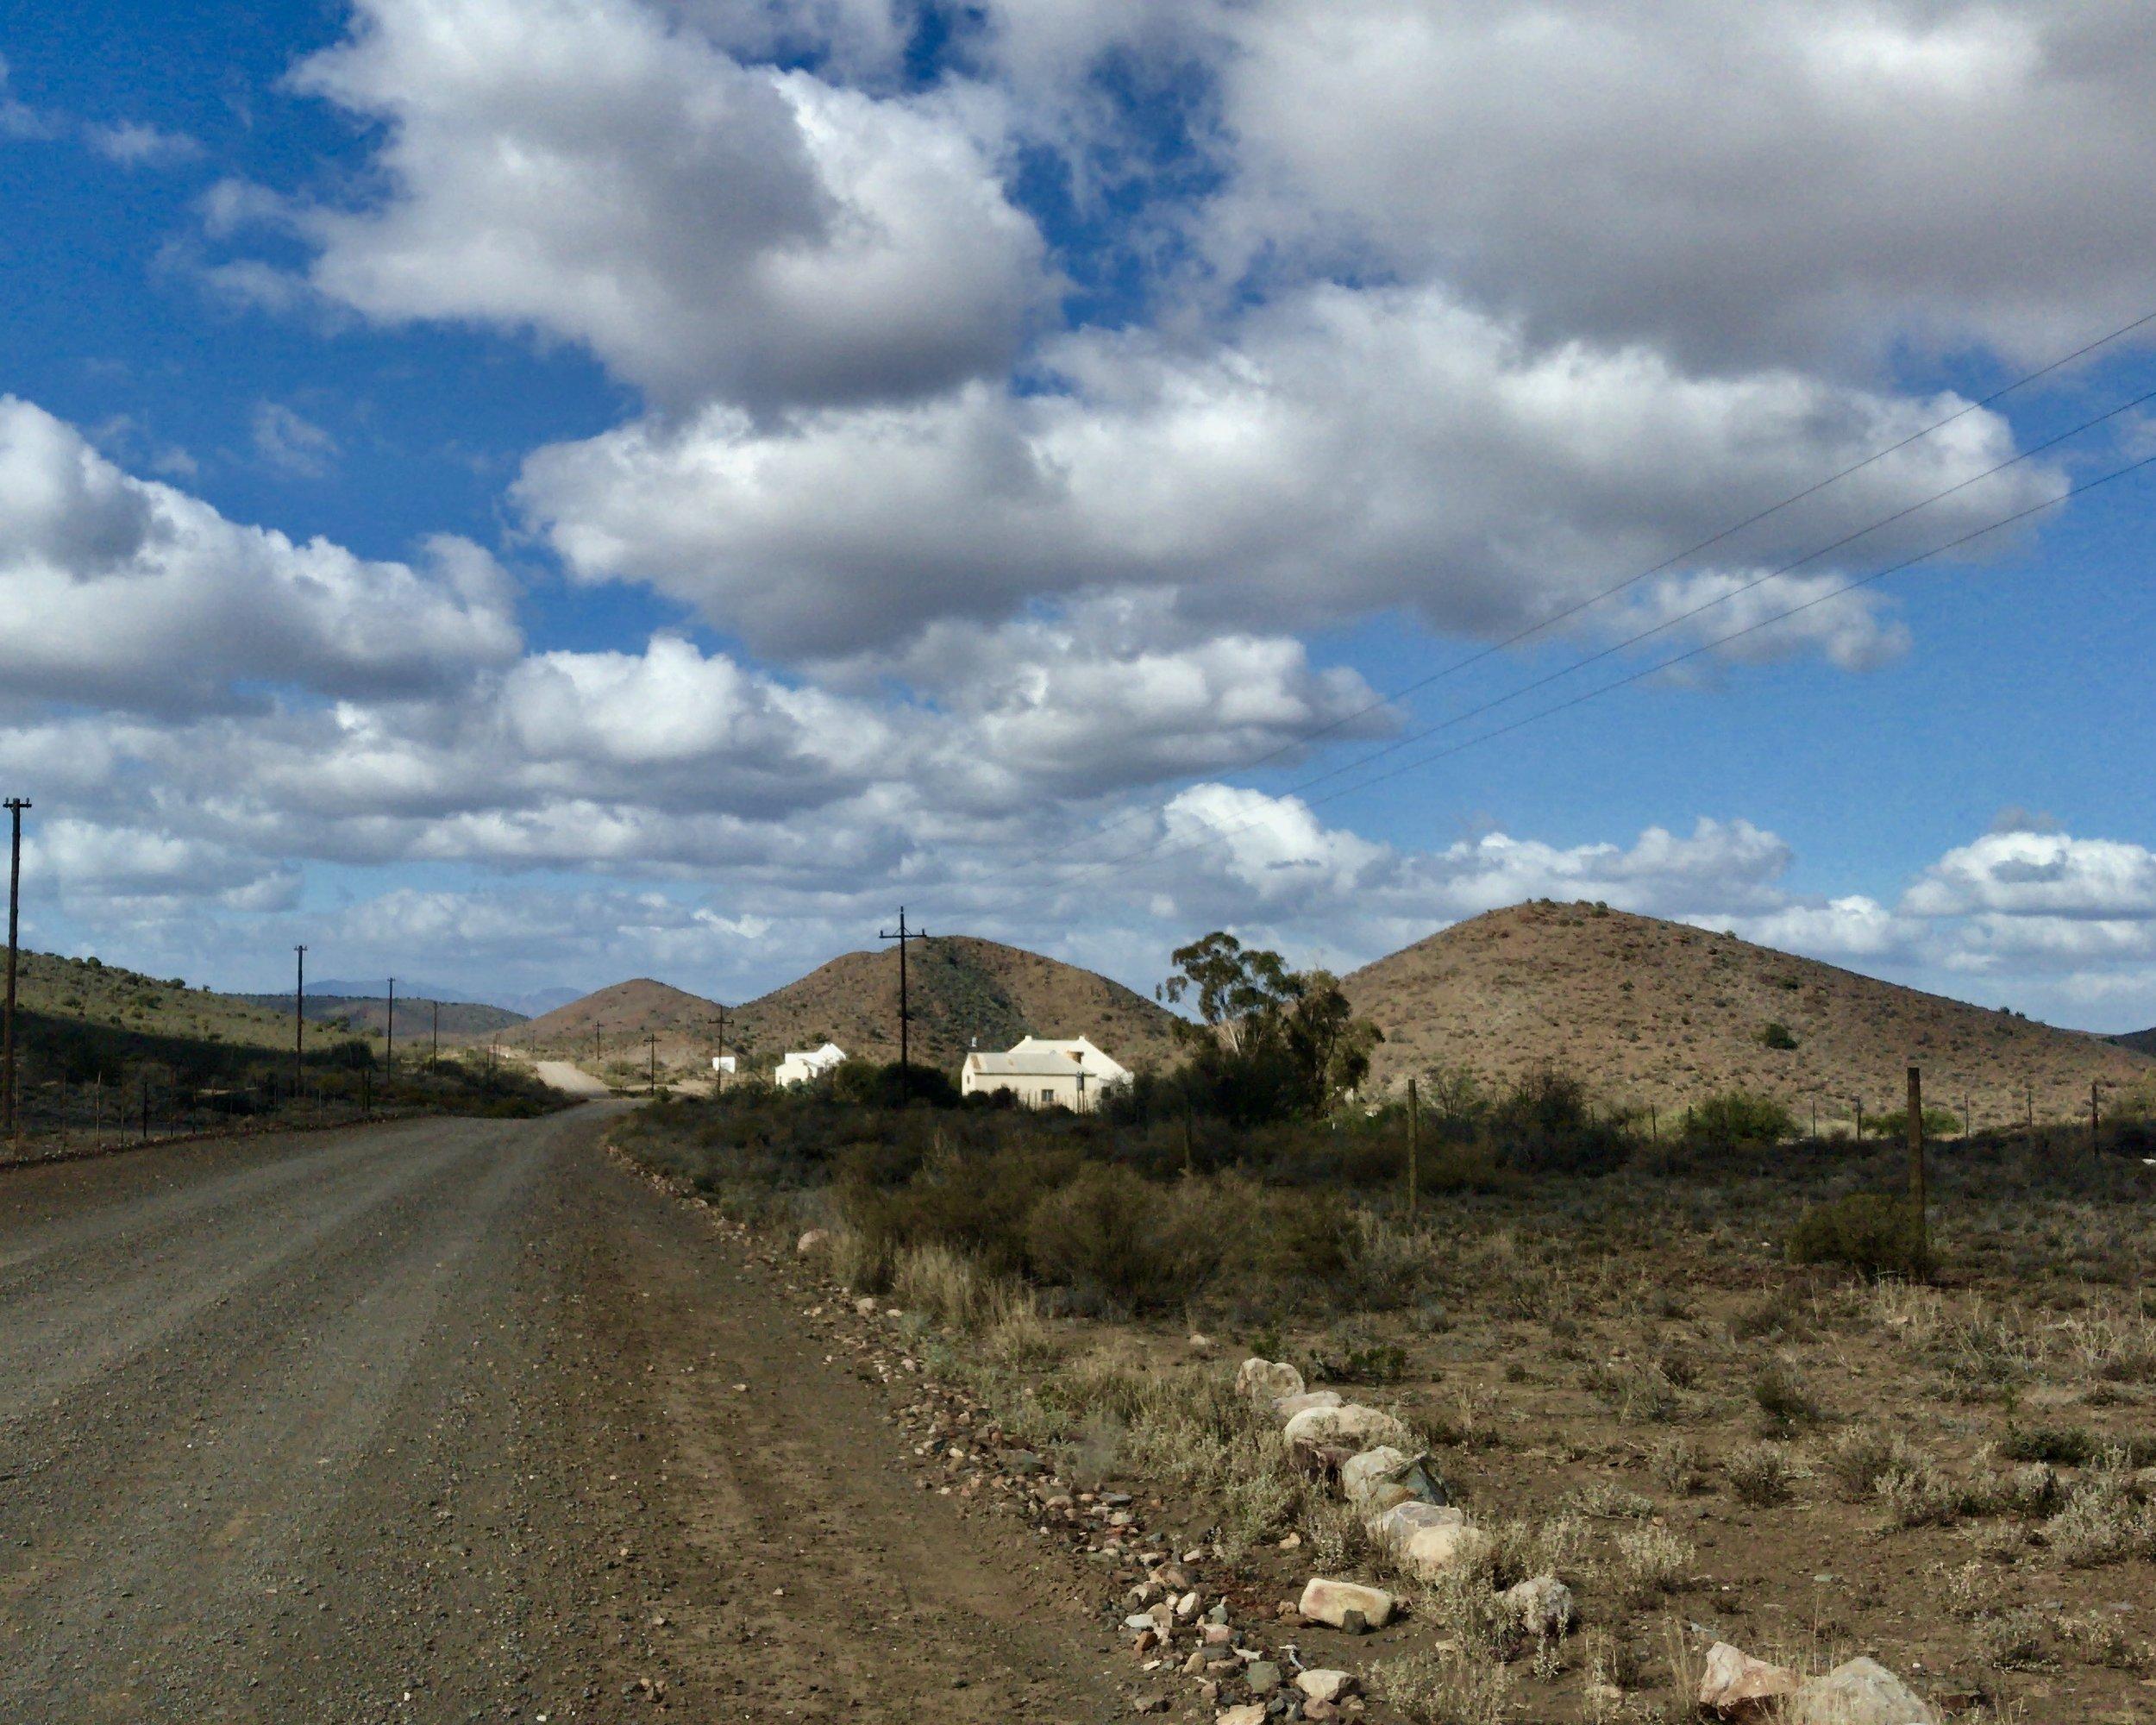 Klein Karoo: Main Road in Plaithus